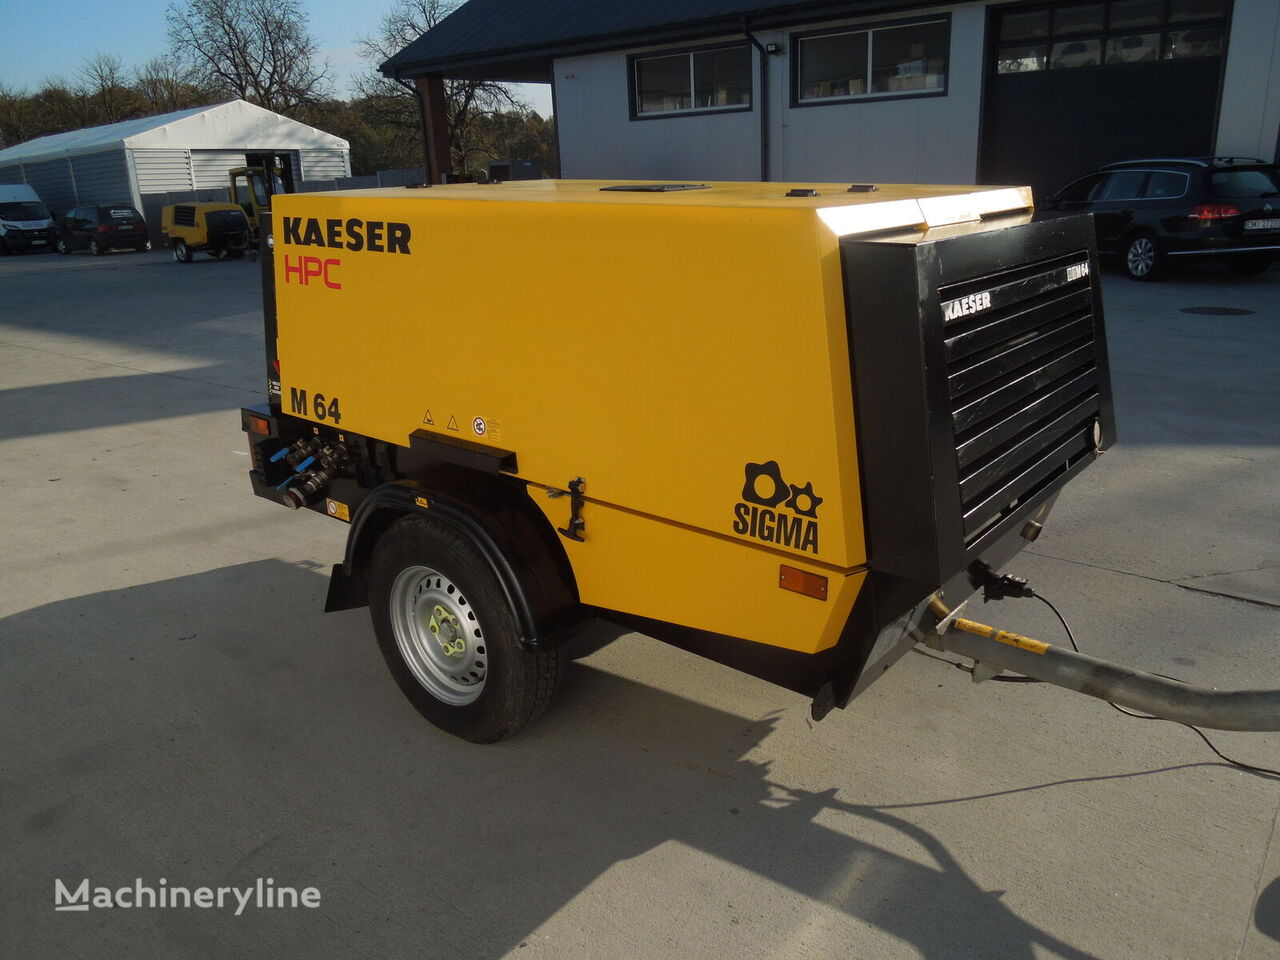 KAESER M64 compressor